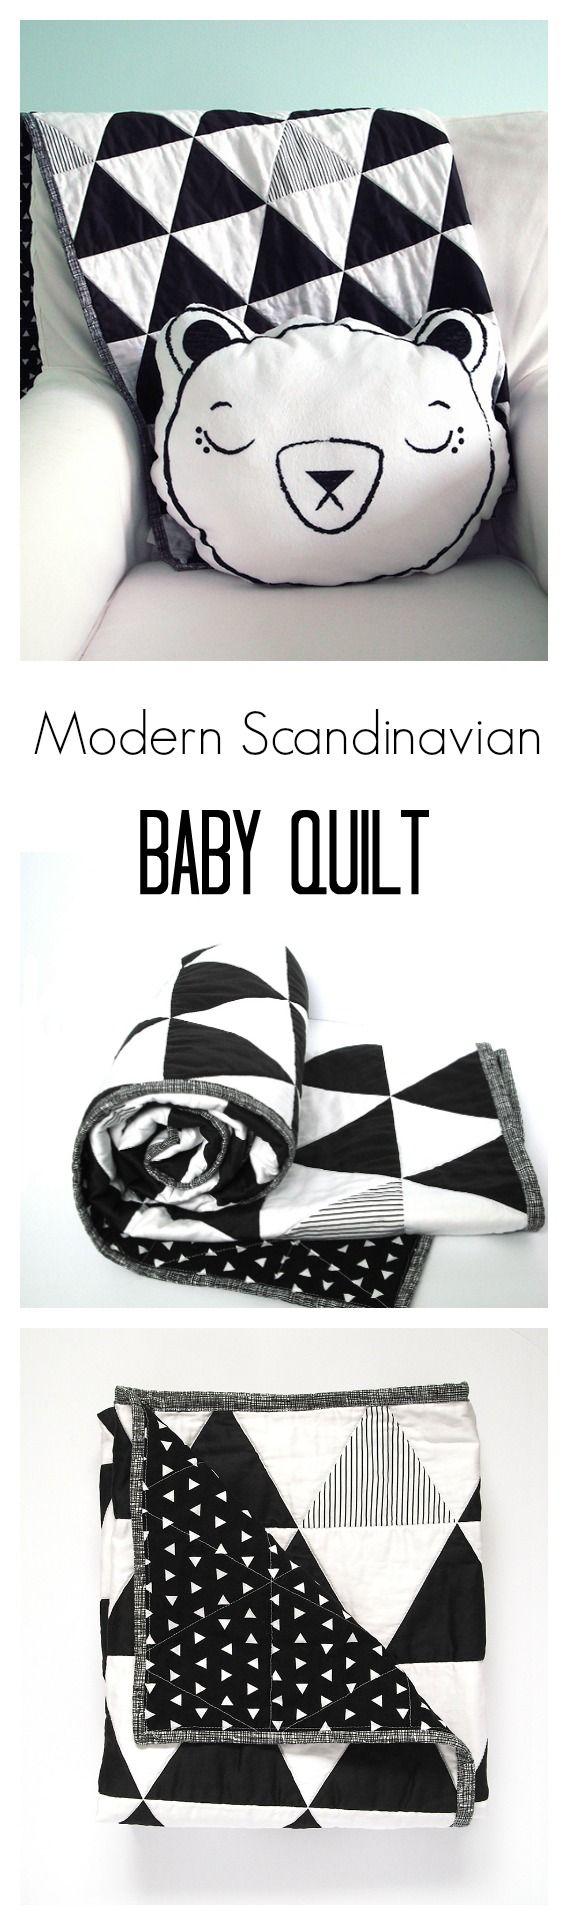 Modern Scandinavian inspired black and white baby quilt